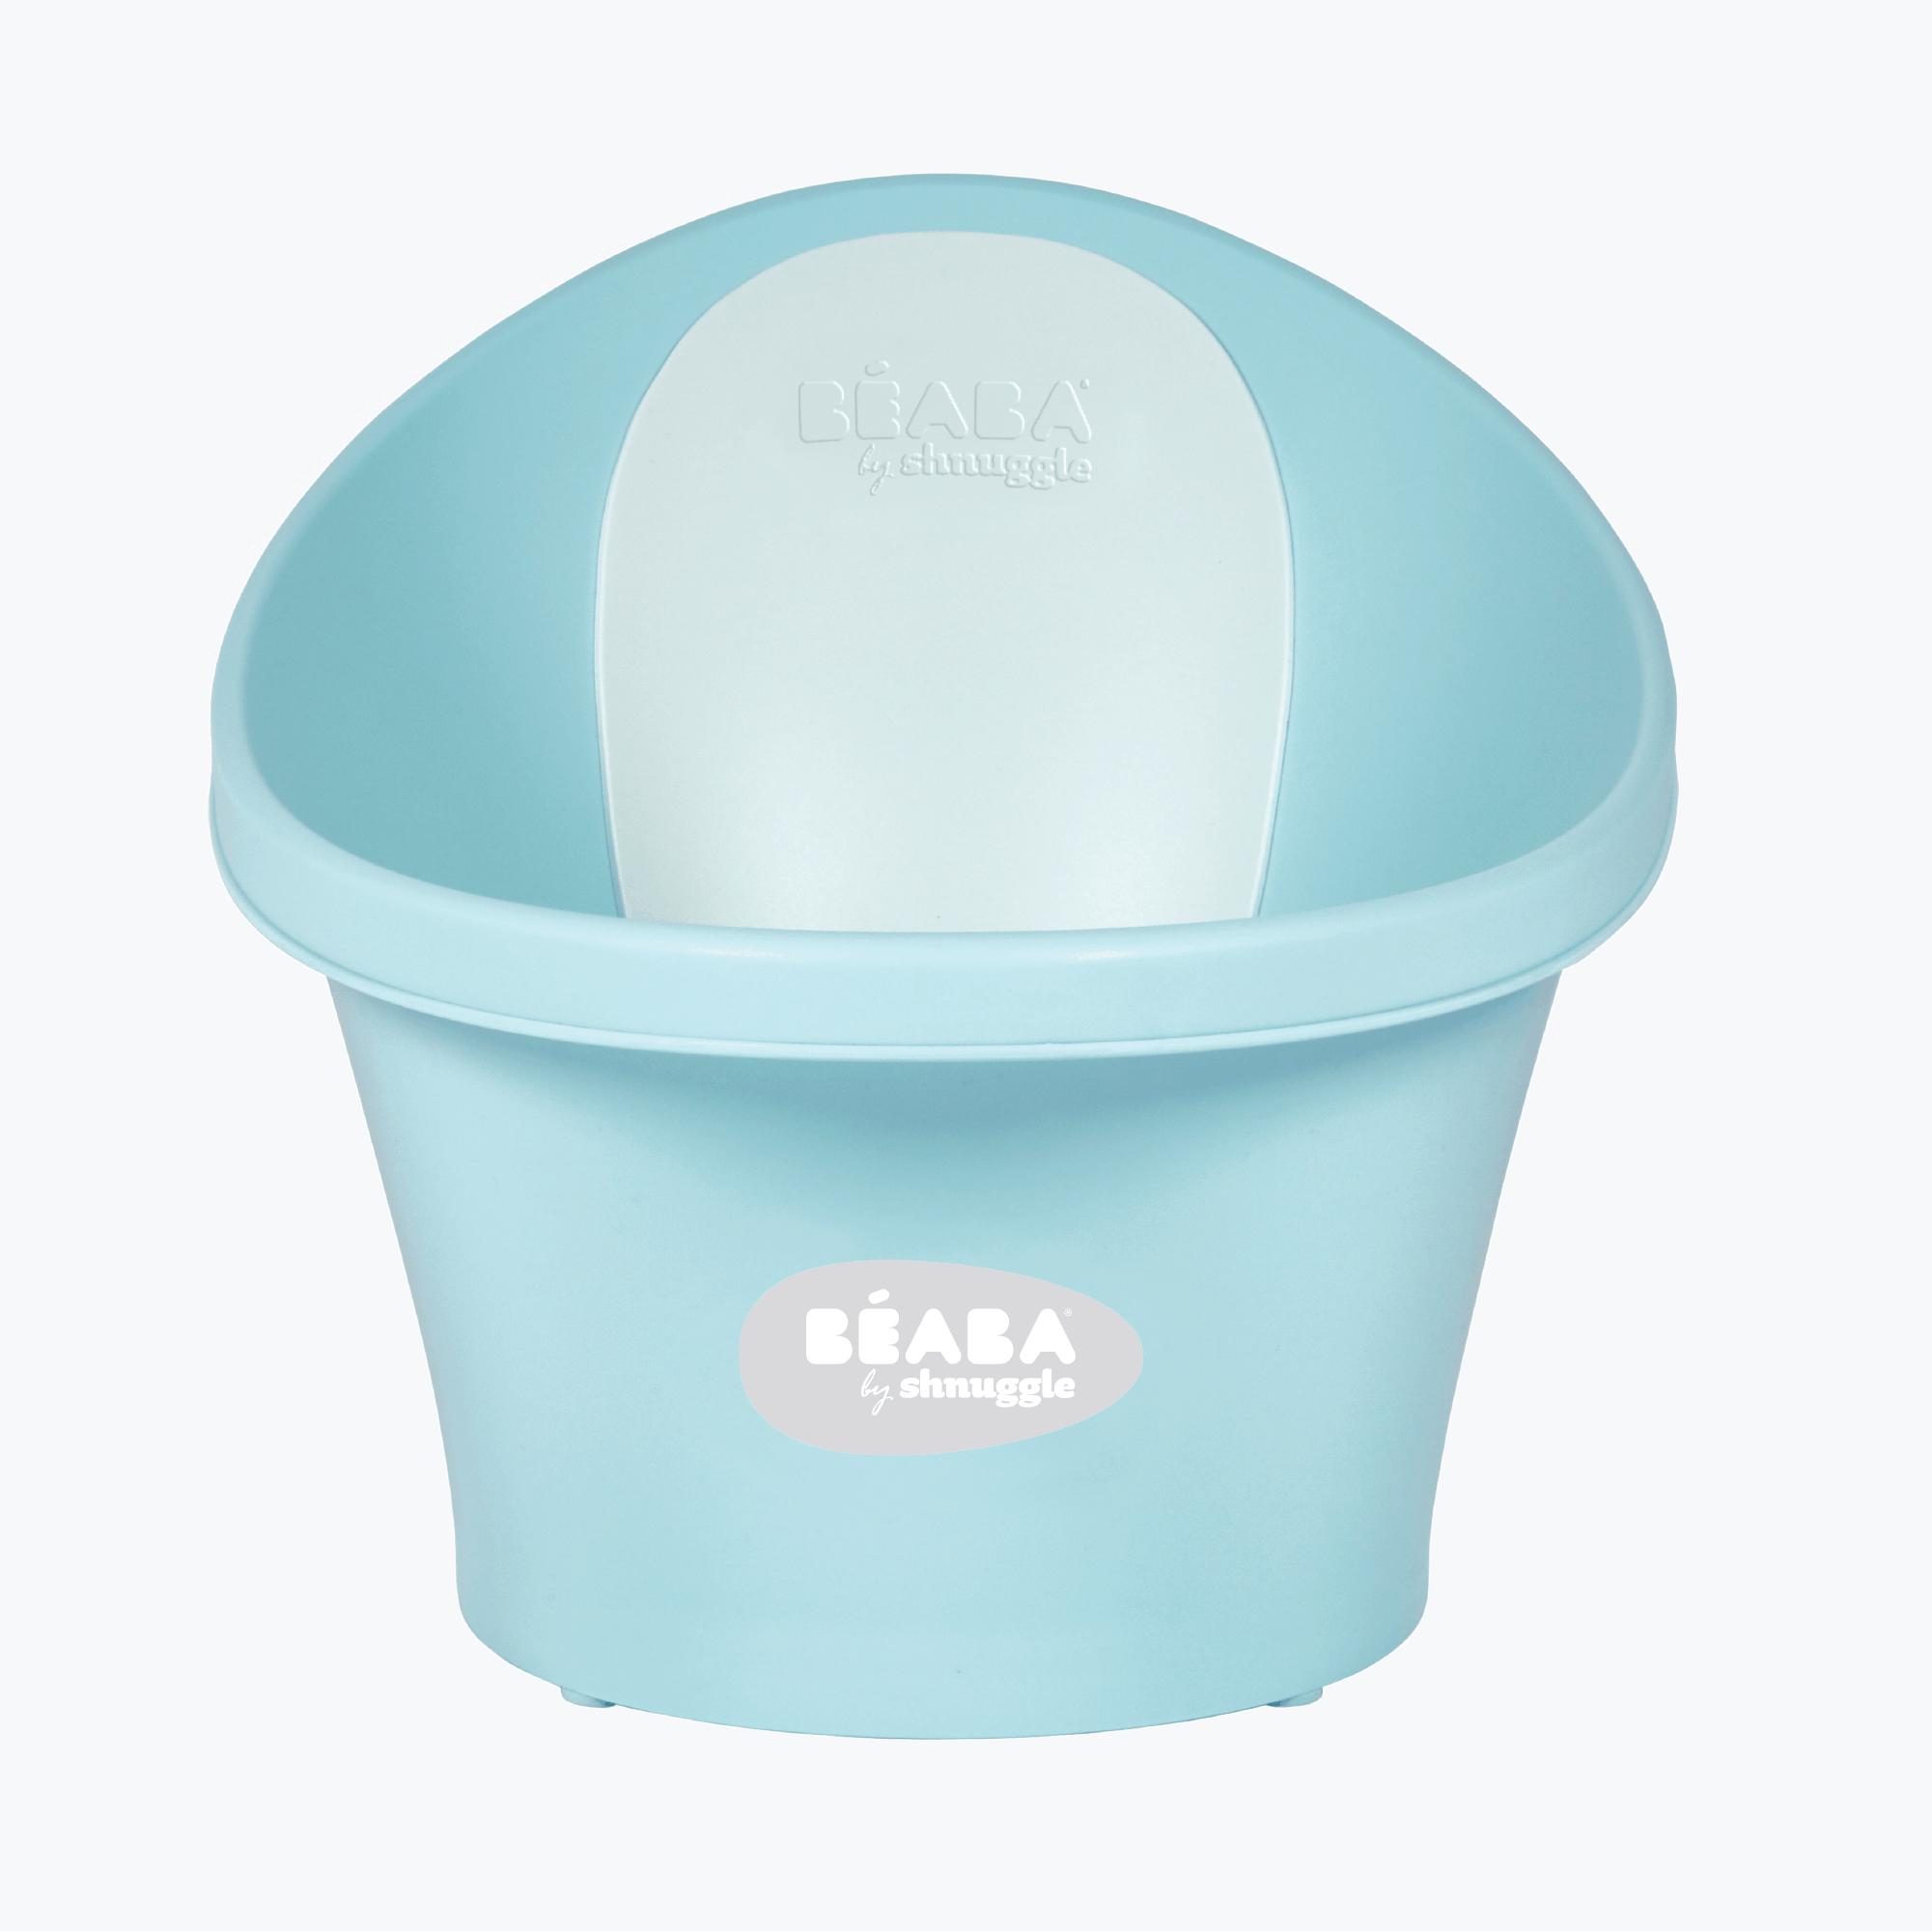 Beaba X Shnuggle Baby Bath Aqua Beaba Usa